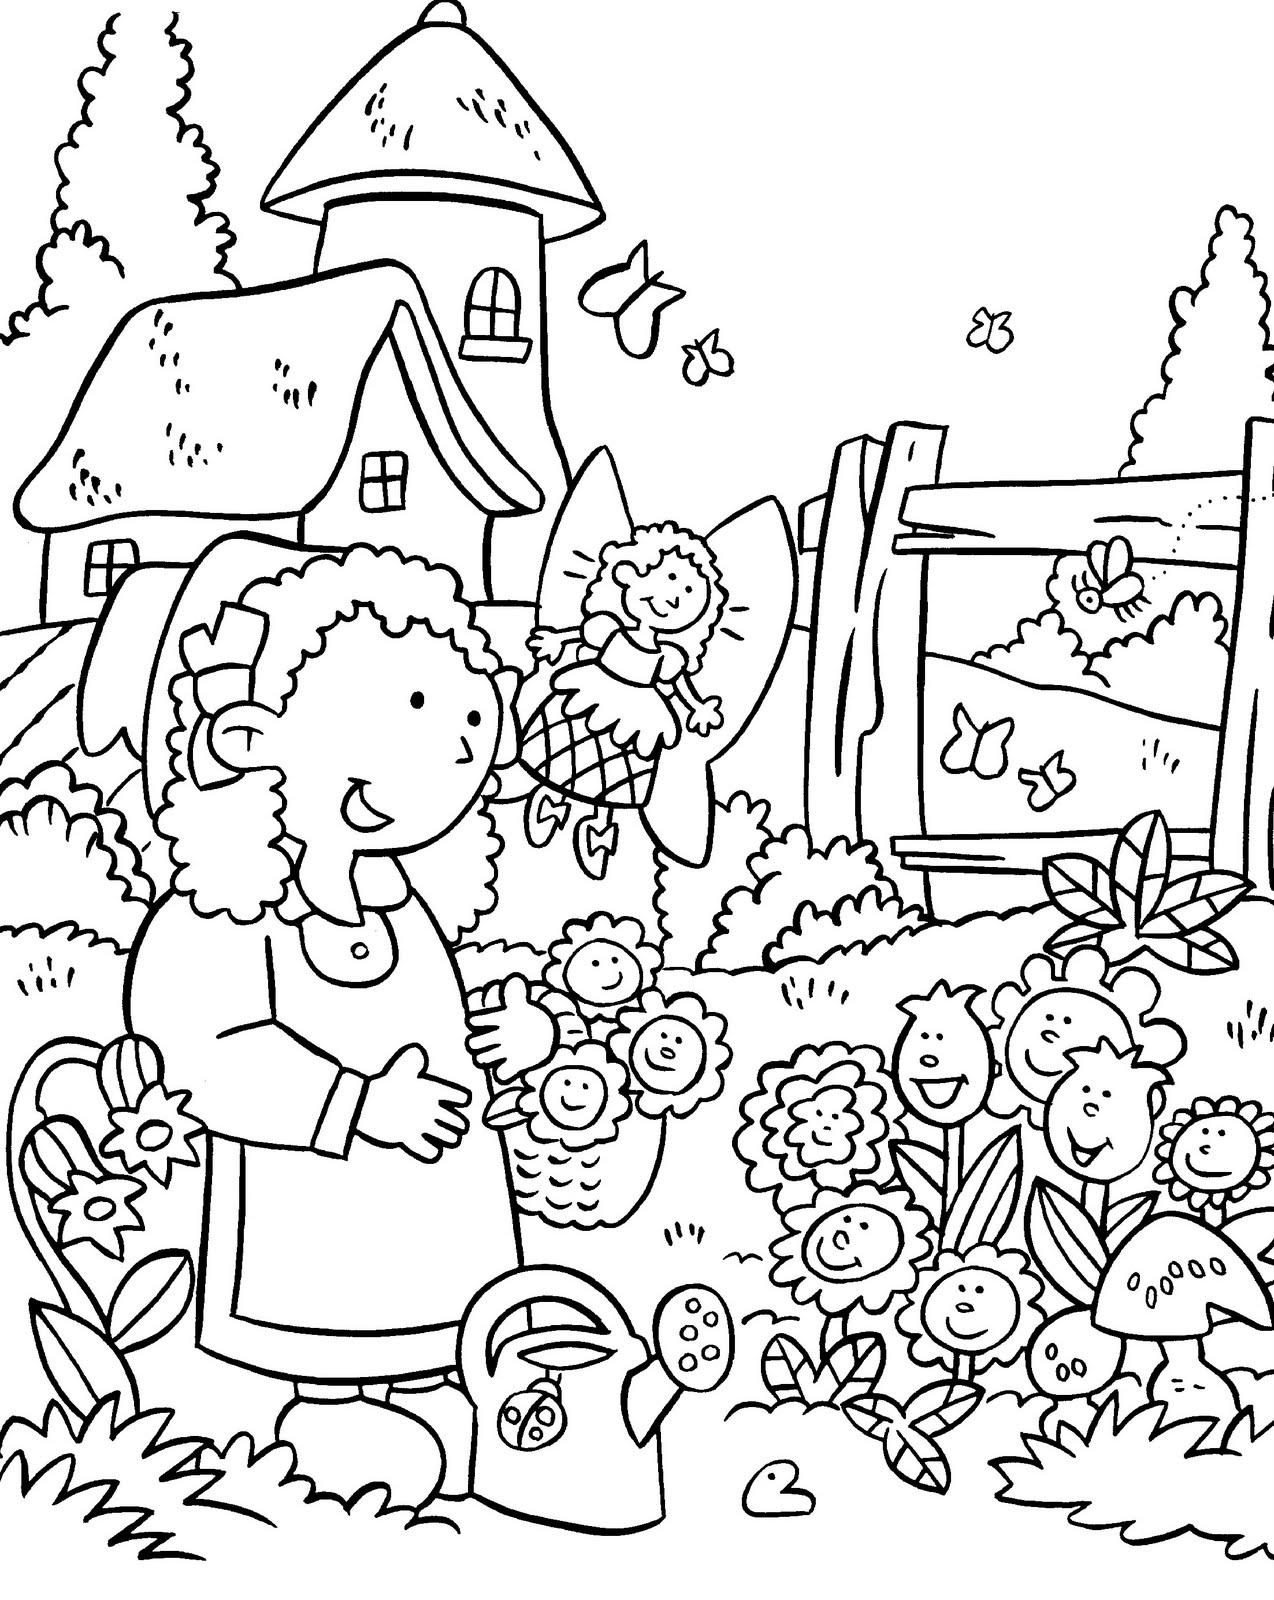 colouring pages garden my little house anna and the flower garden coloring pages colouring pages garden